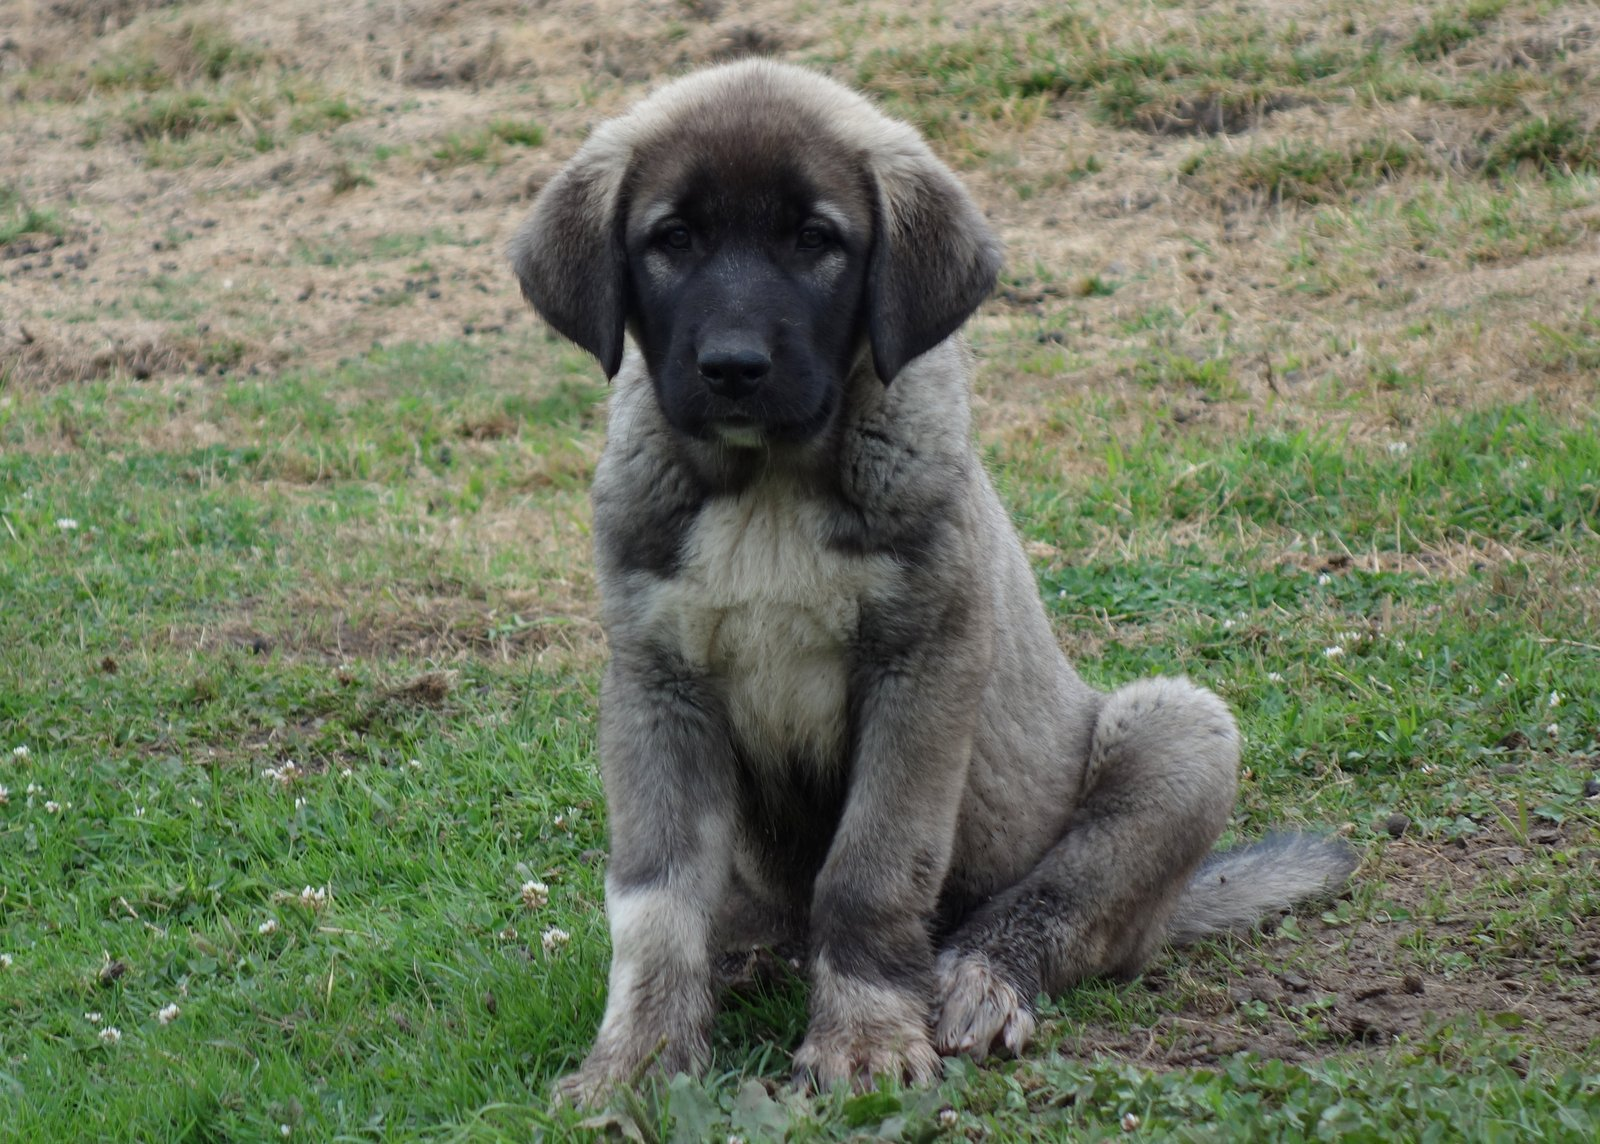 Shepherds Rest Farm: ANATOLIAN SHEPHERD PUPPIES AVAILABLE